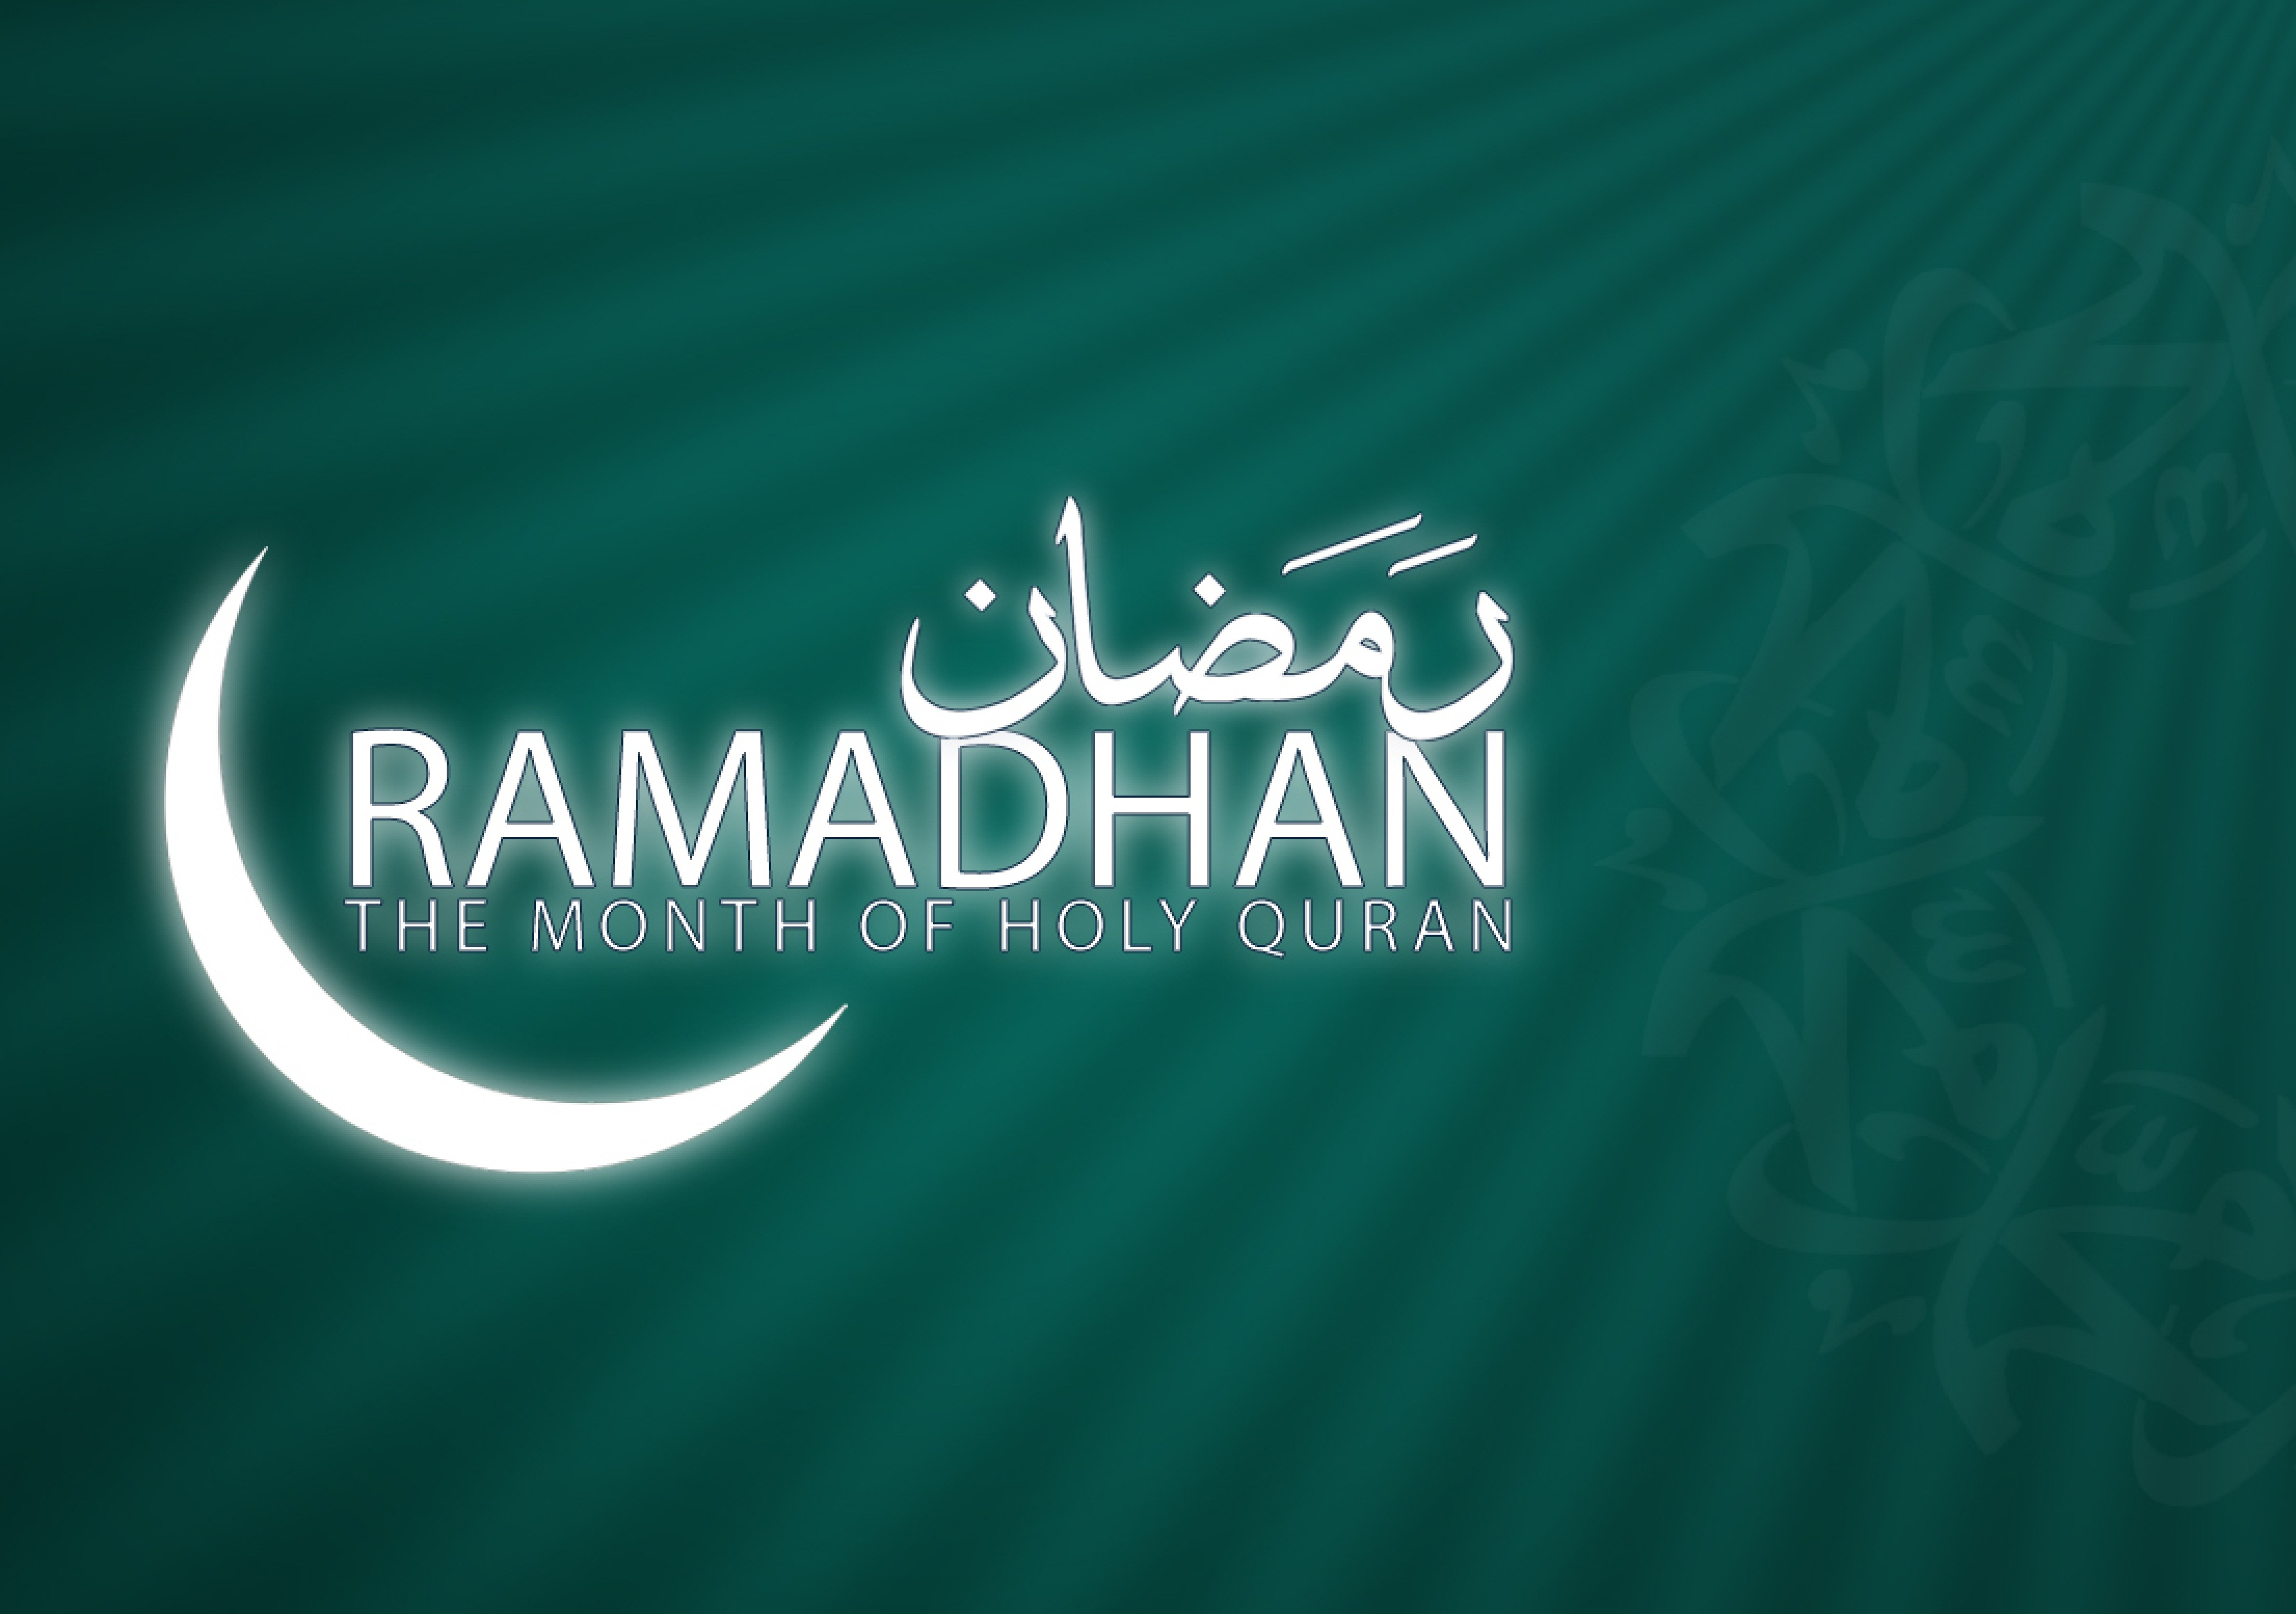 Amalan Bulan Suci Ramadhan